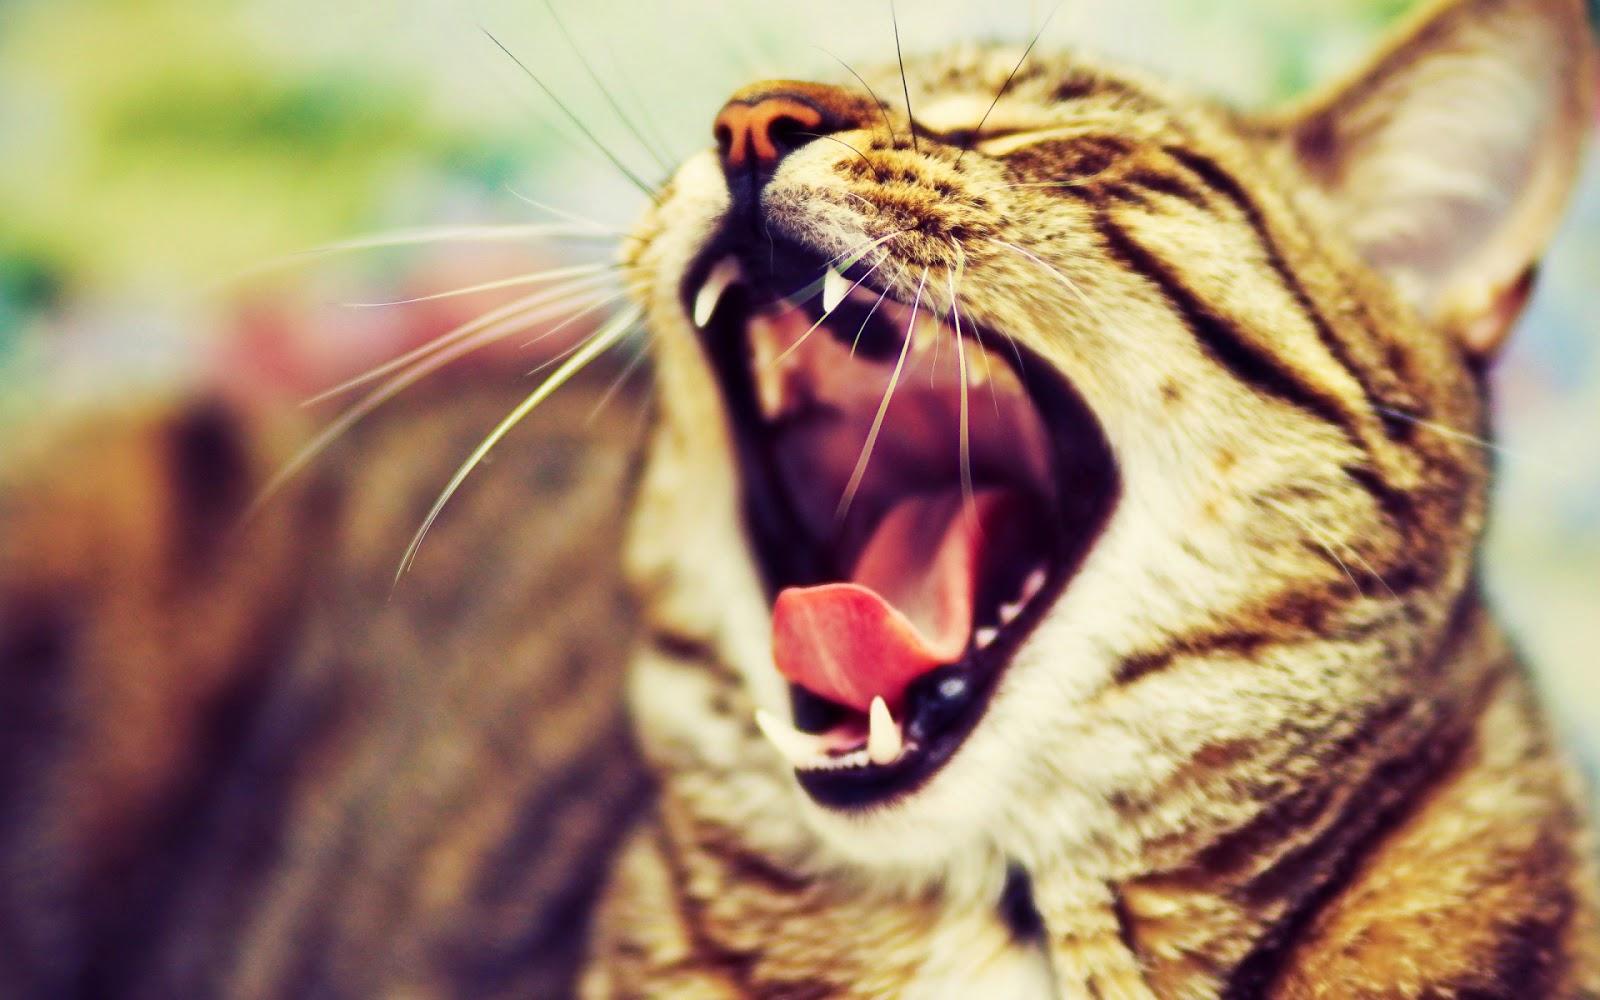 10 Gambar Kucing Menganga Lucu